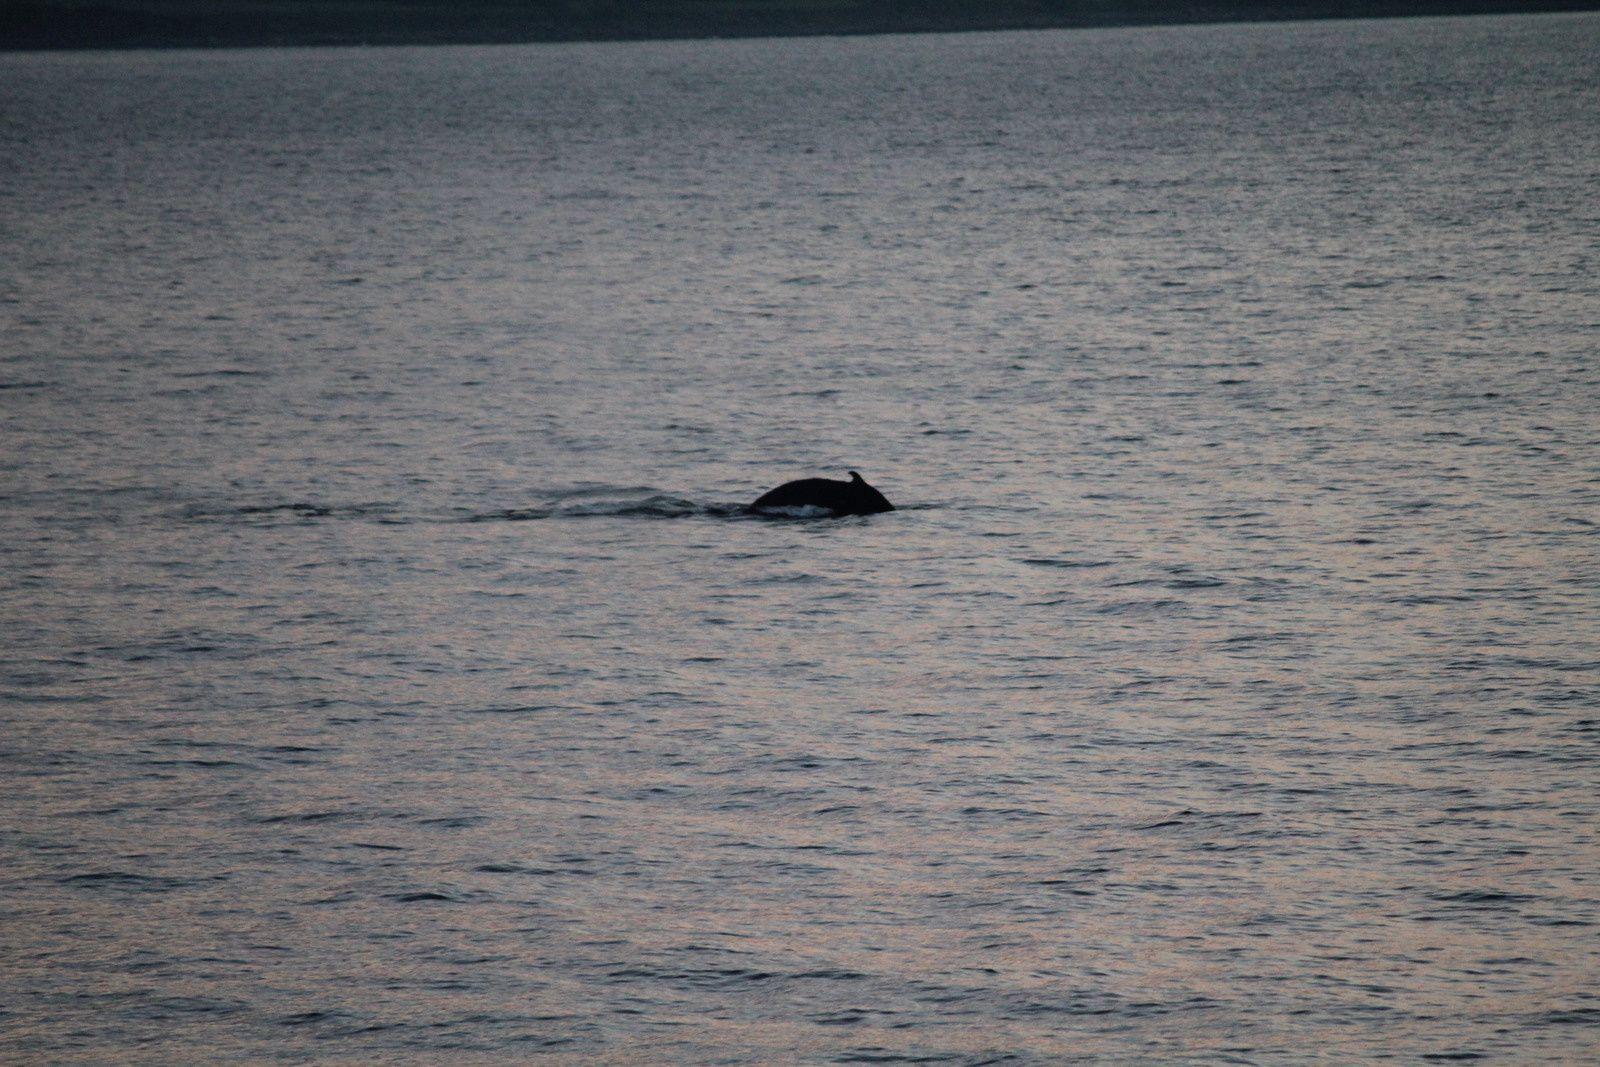 Hourra! J'ai vu une baleine!